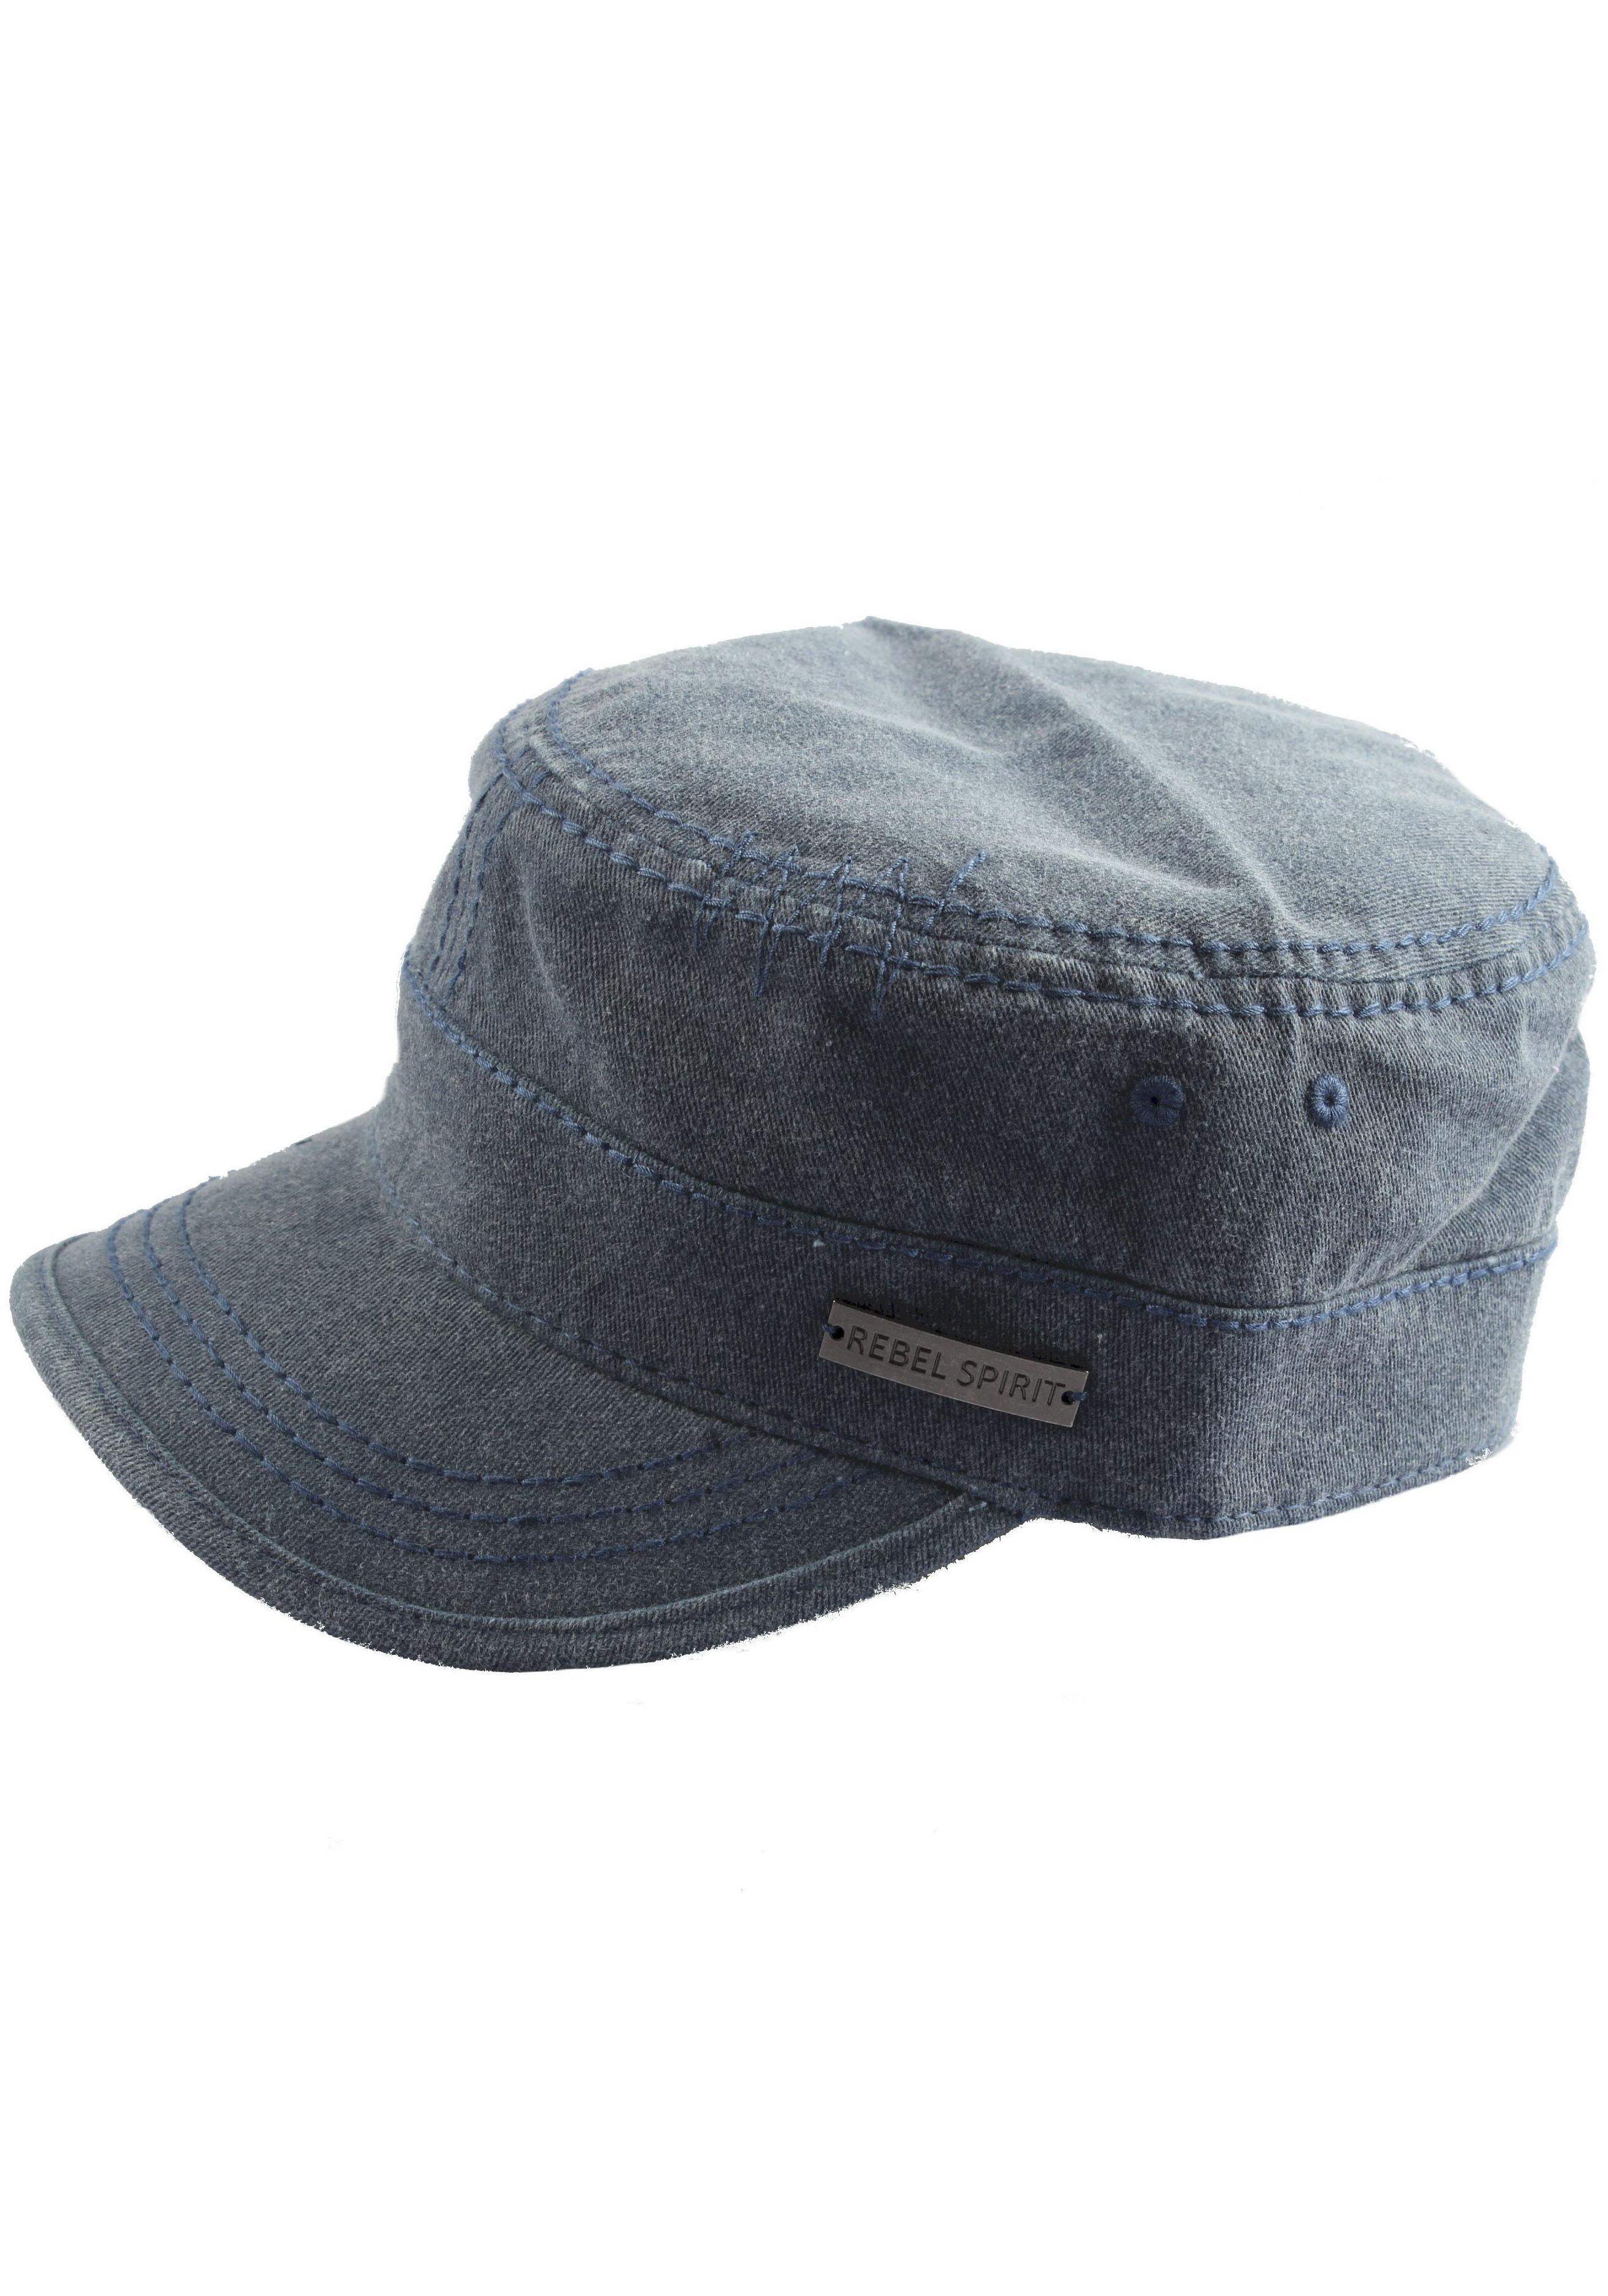 Wegener Army Cap | Accessoires > Caps > Army Caps | Wegener